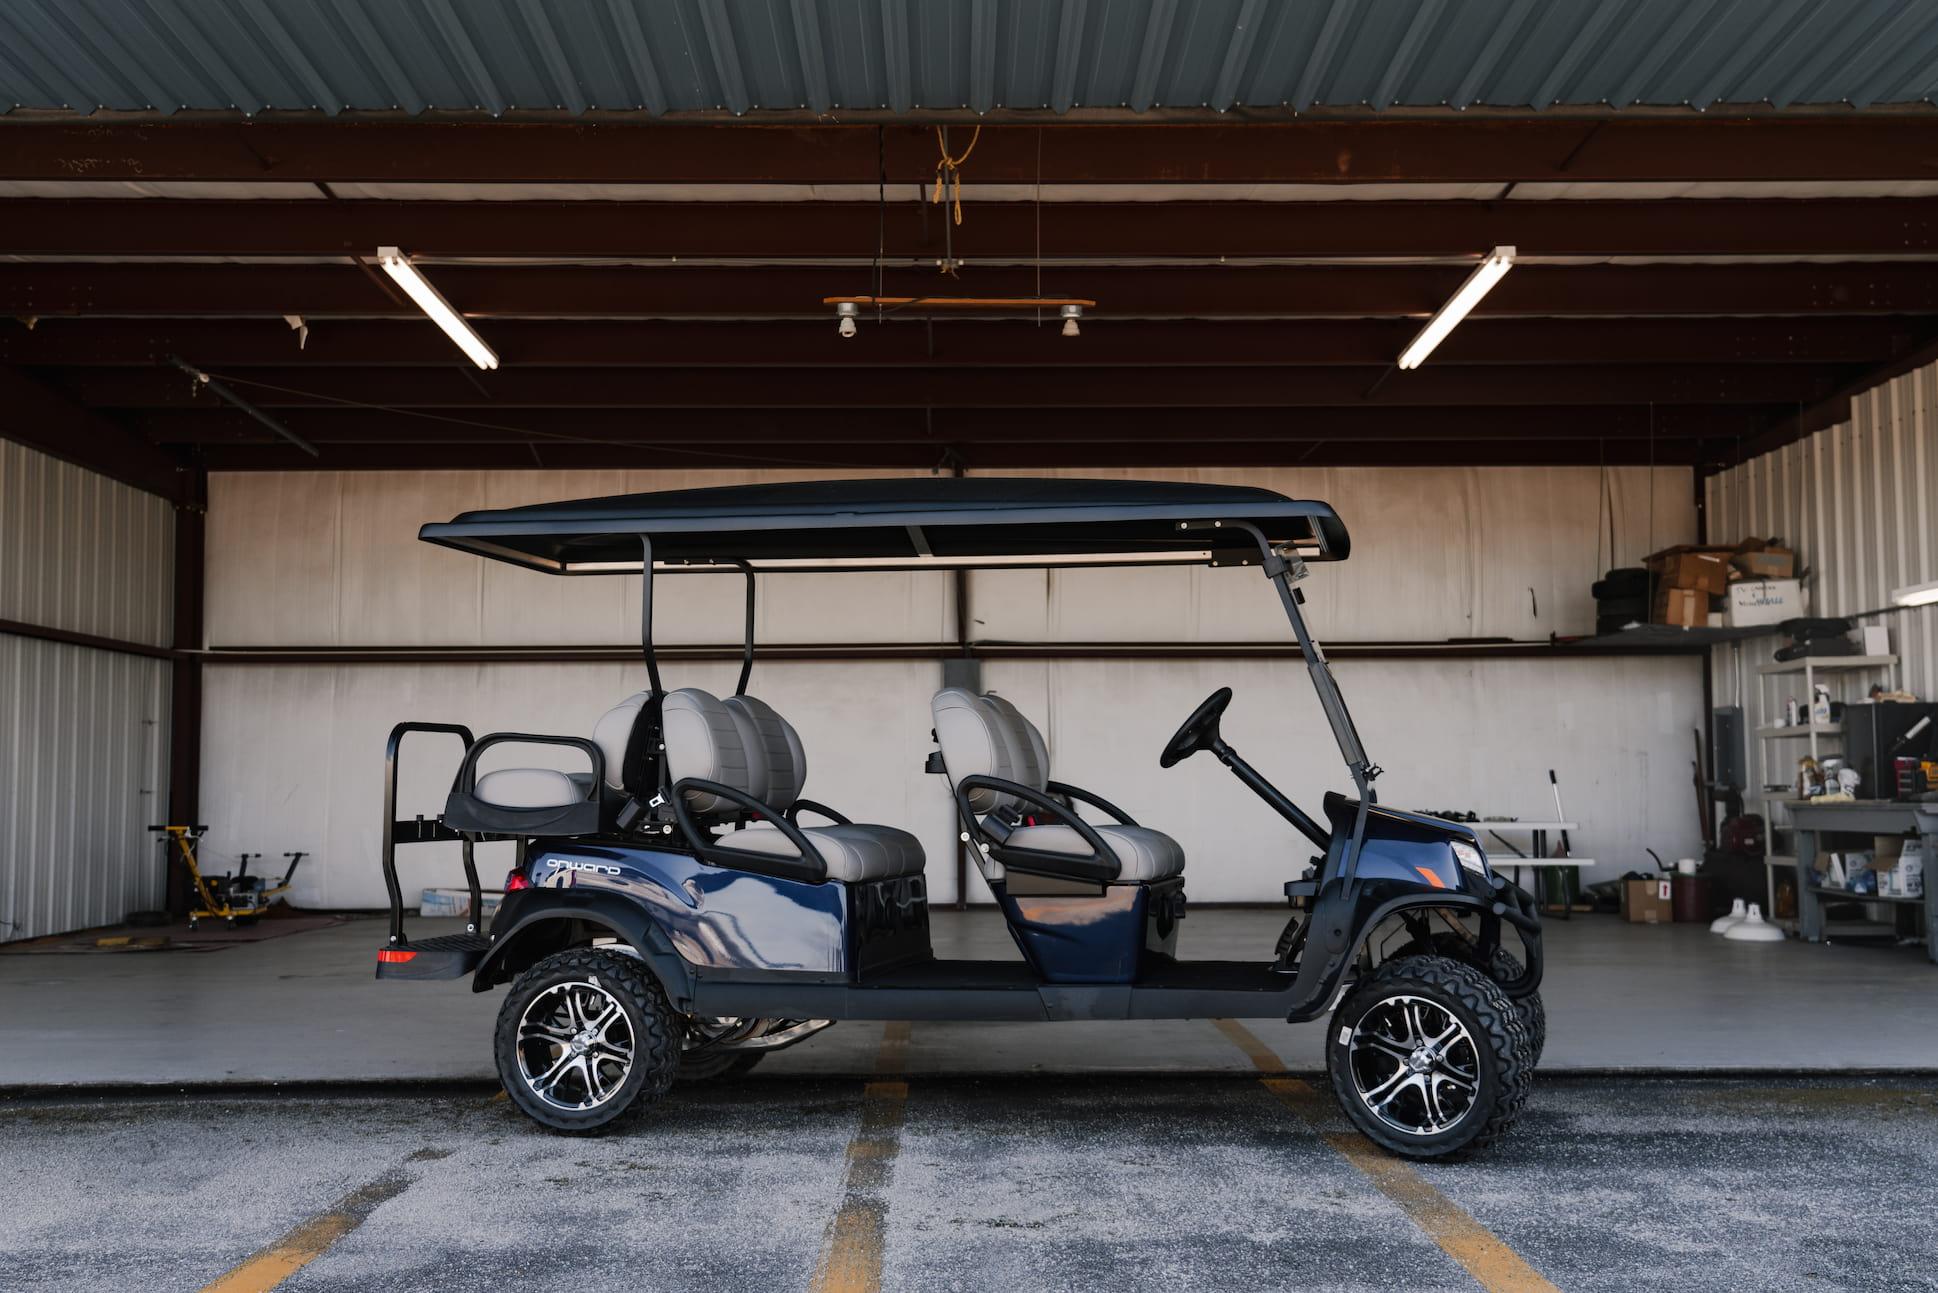 Extra long new golf cart | Statesboro Golf Carts | Golf Carts for sale